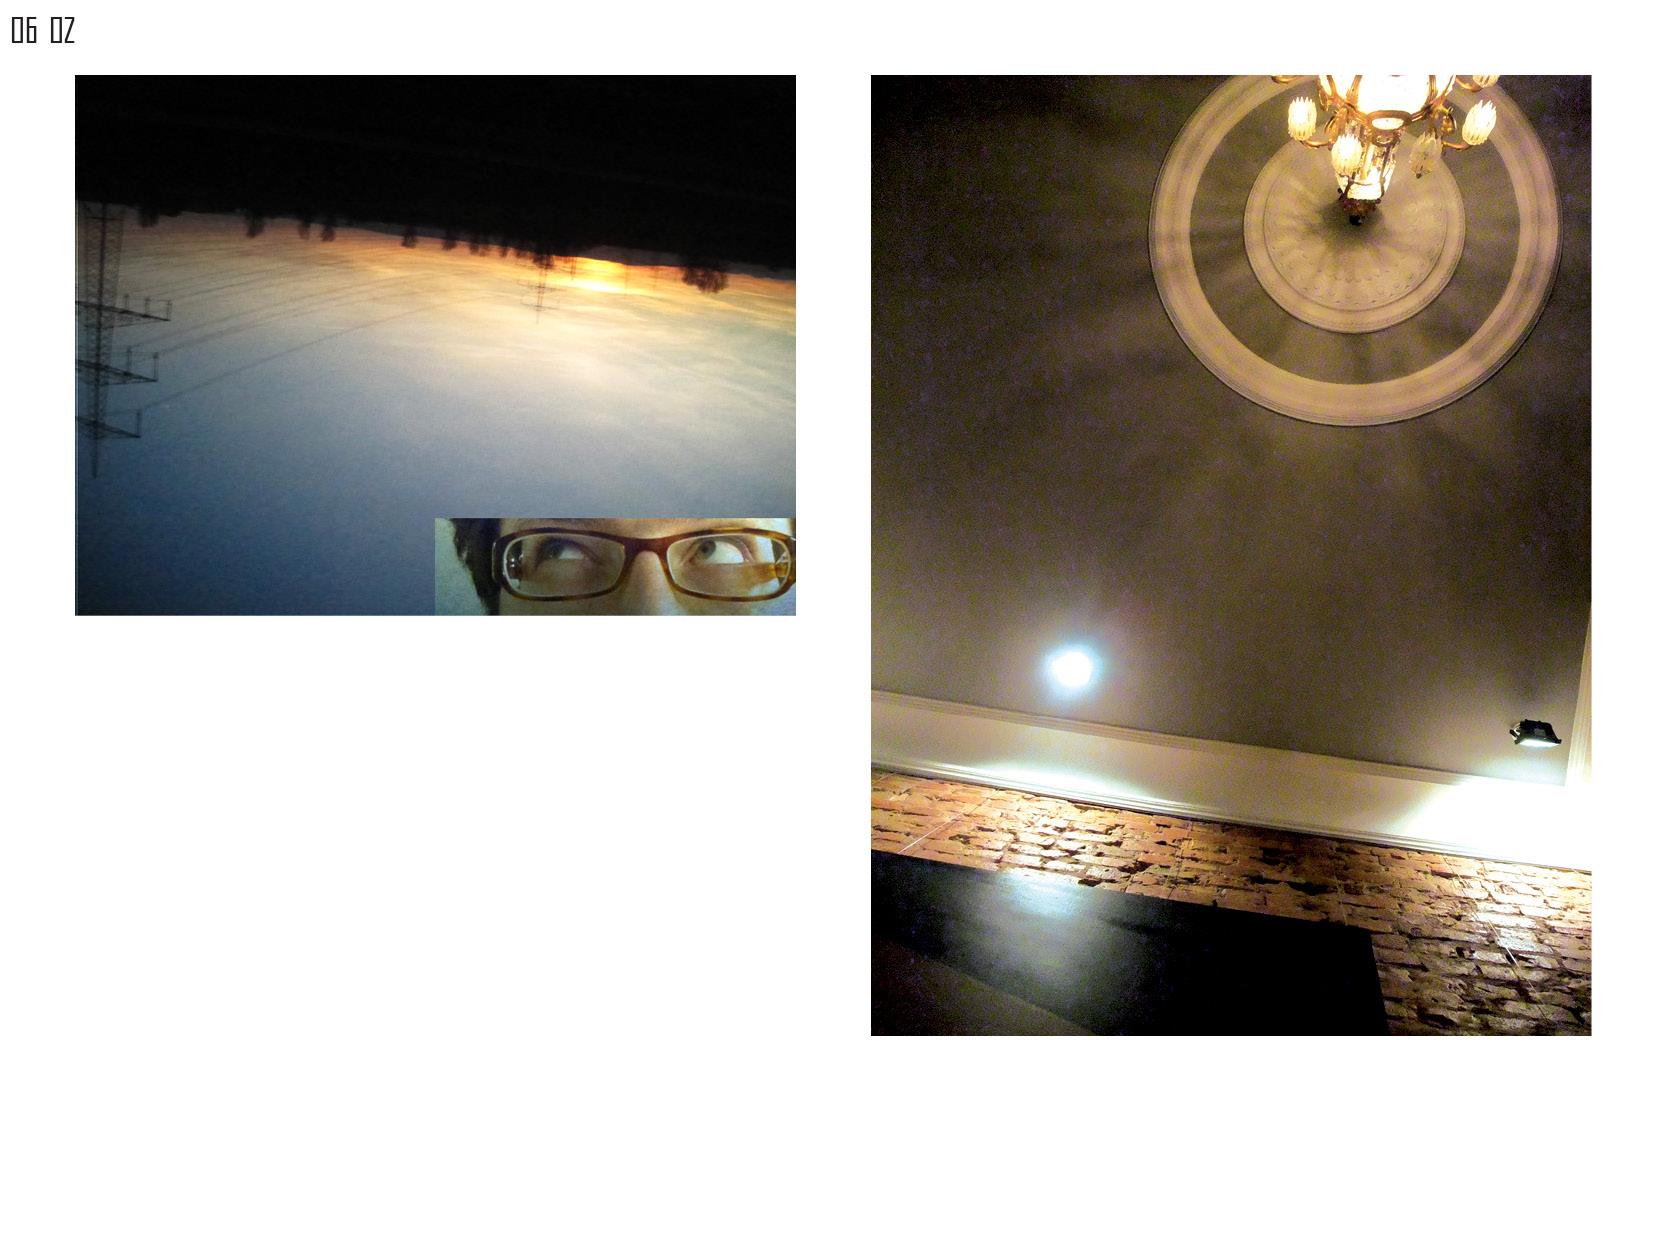 Gerrit-Schweiger-Dialog-Städte-Paris-Berlin-Jessica-Blank-Experiment-Fotoserie-Tagebuch-visuelle-Kommunikation-97